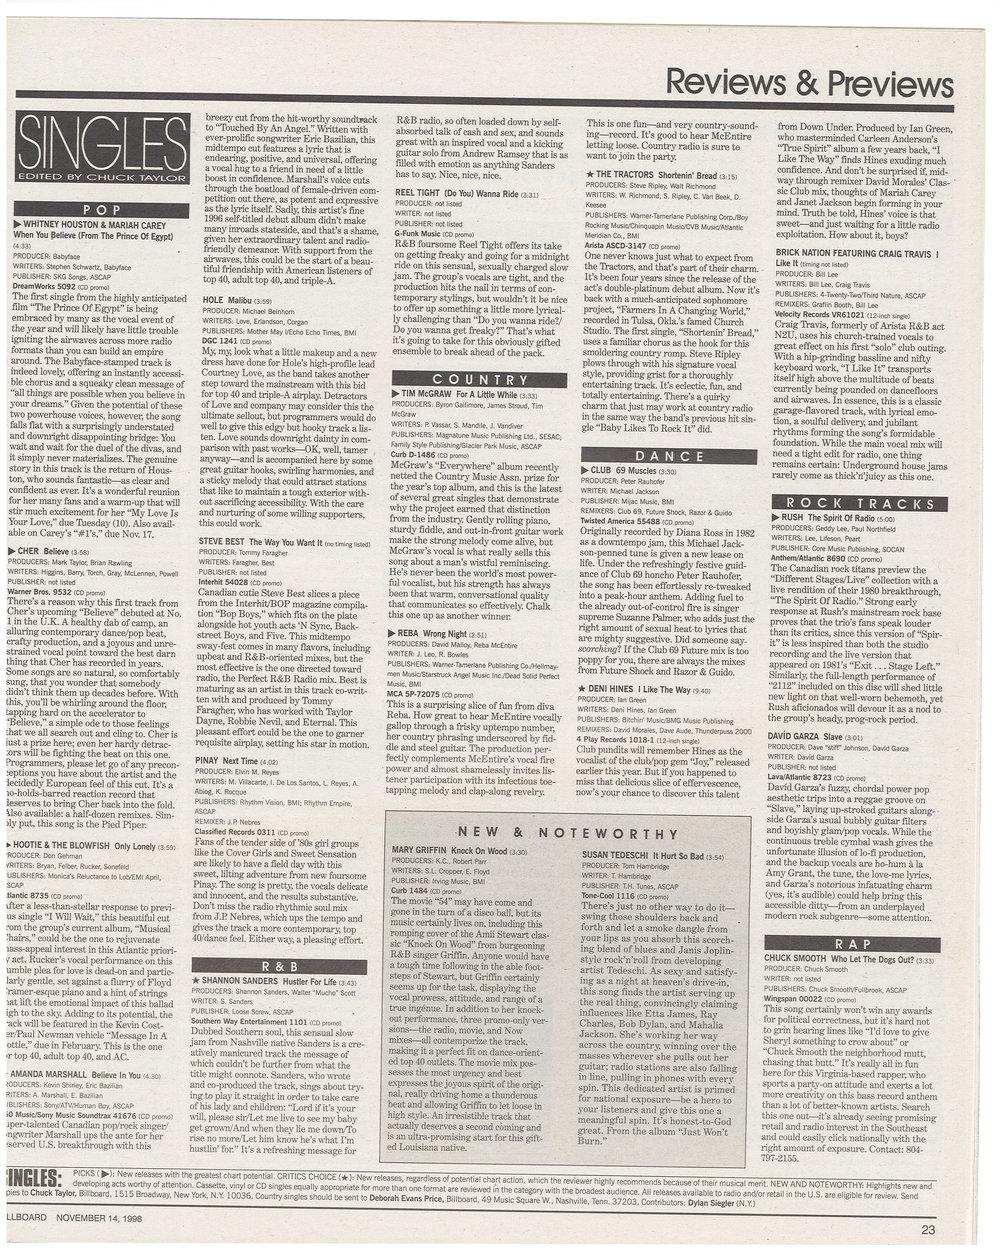 WLWLTDOO-1998-PRINT-BILLOBARD-CHUCK_SMOOTH-BACK.jpg